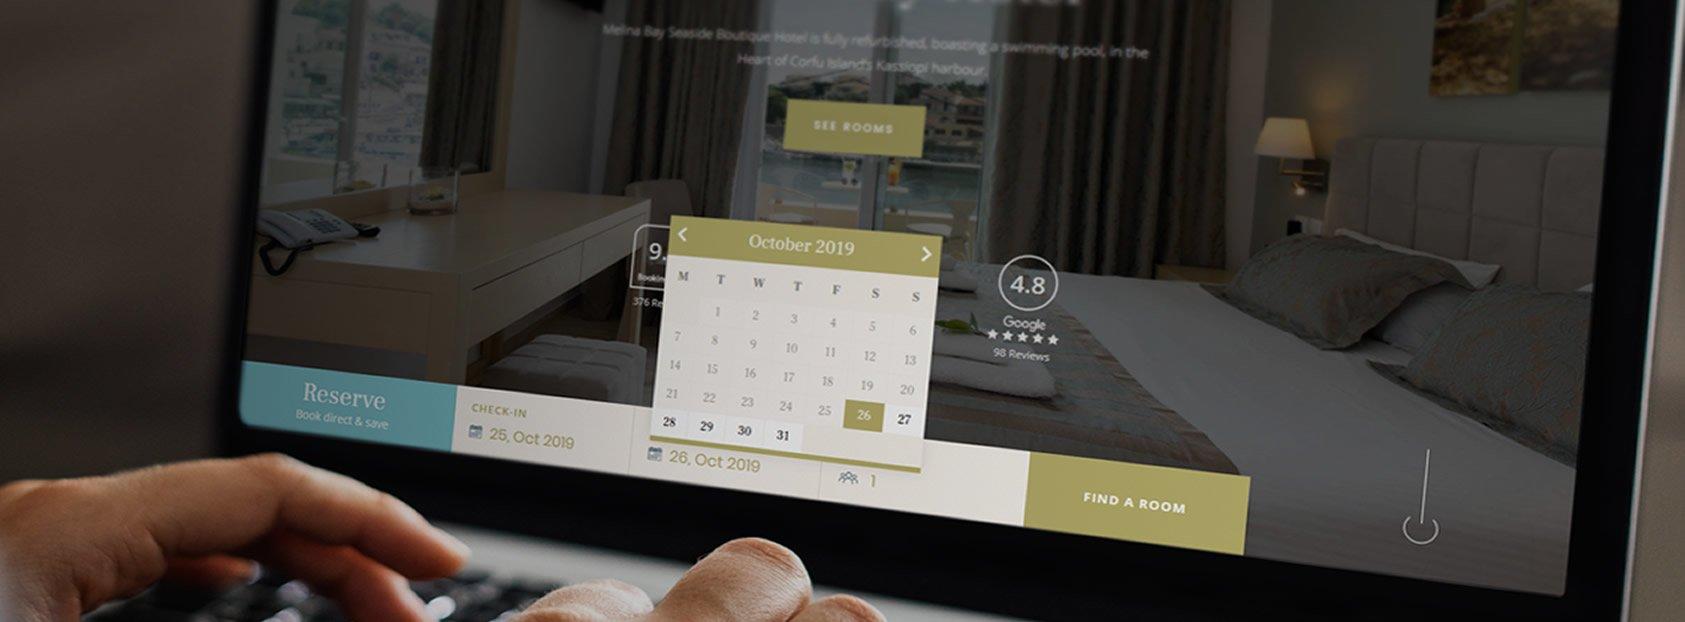 calendar-online-booking-system-1